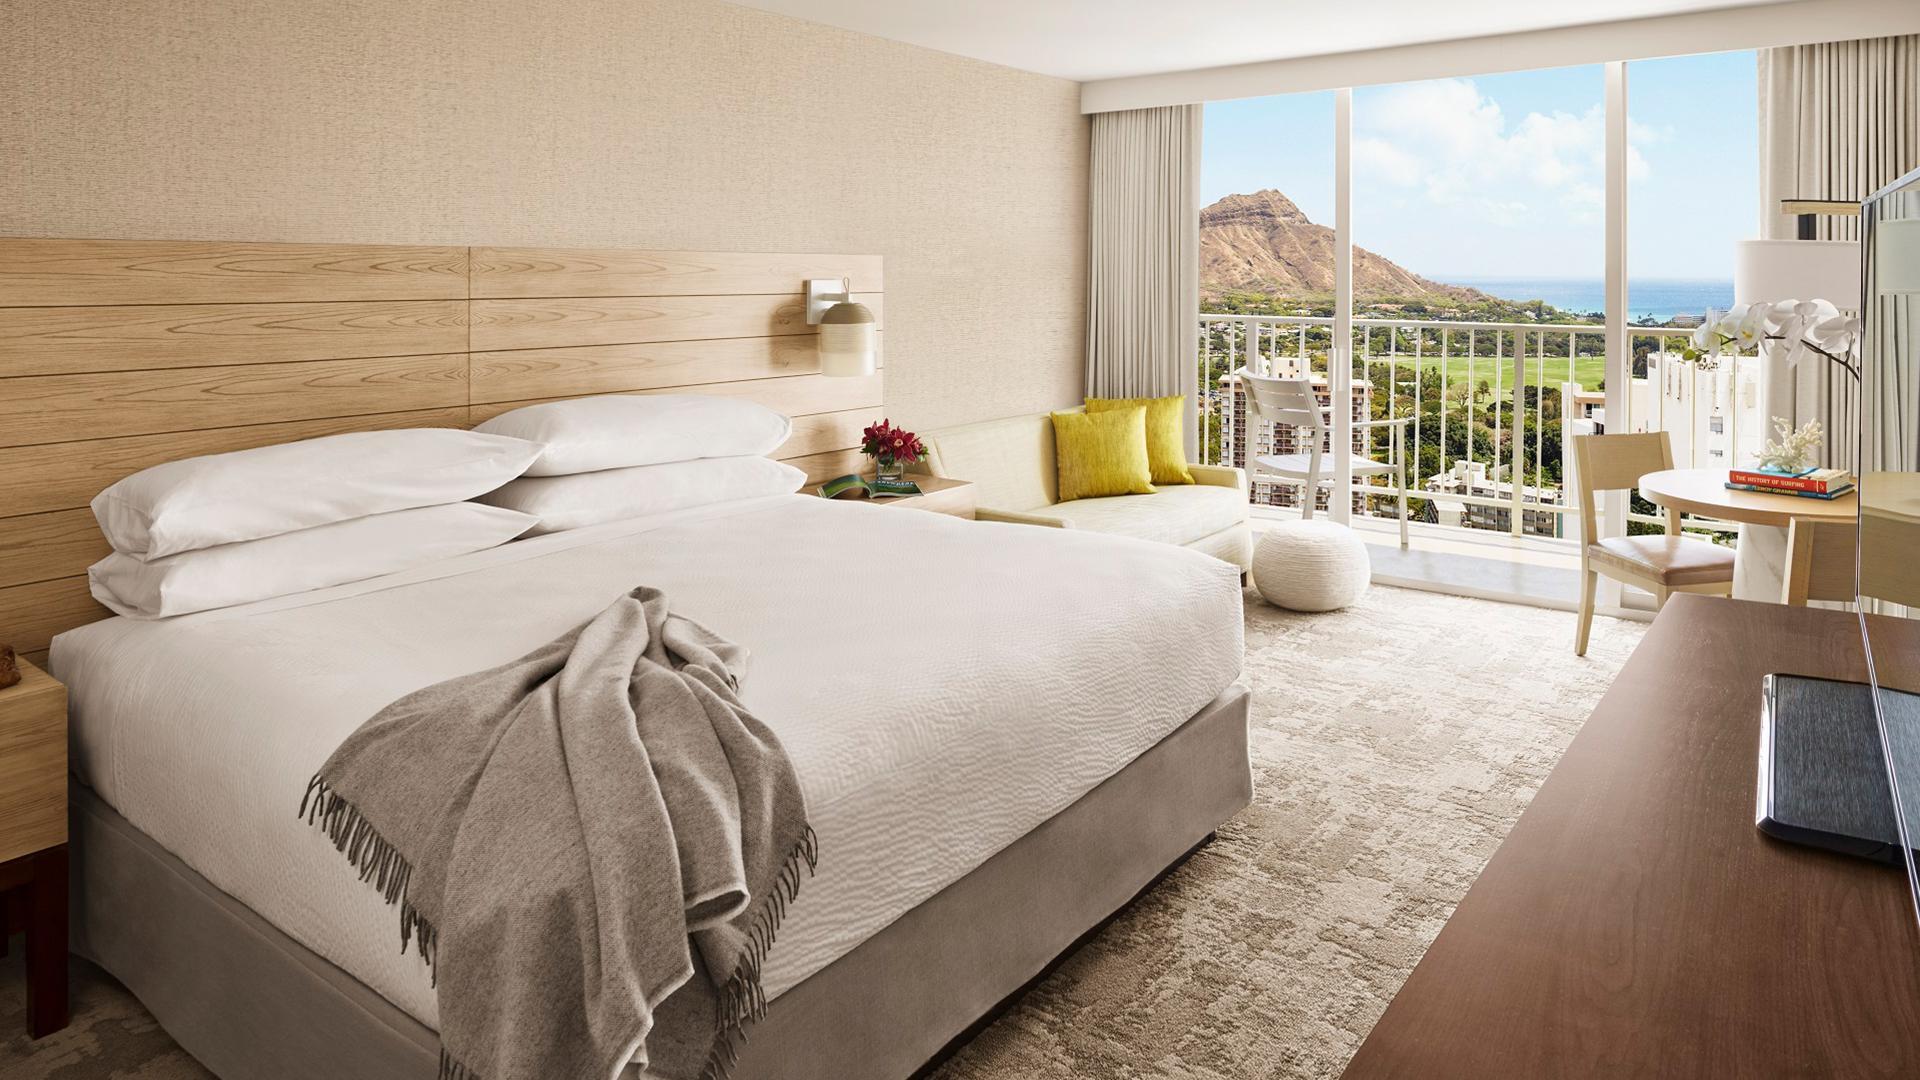 Diamond Head Ocean View King image 1 at 'Alohilani Resort Waikiki Beach by Honolulu County, Hawaii, United States